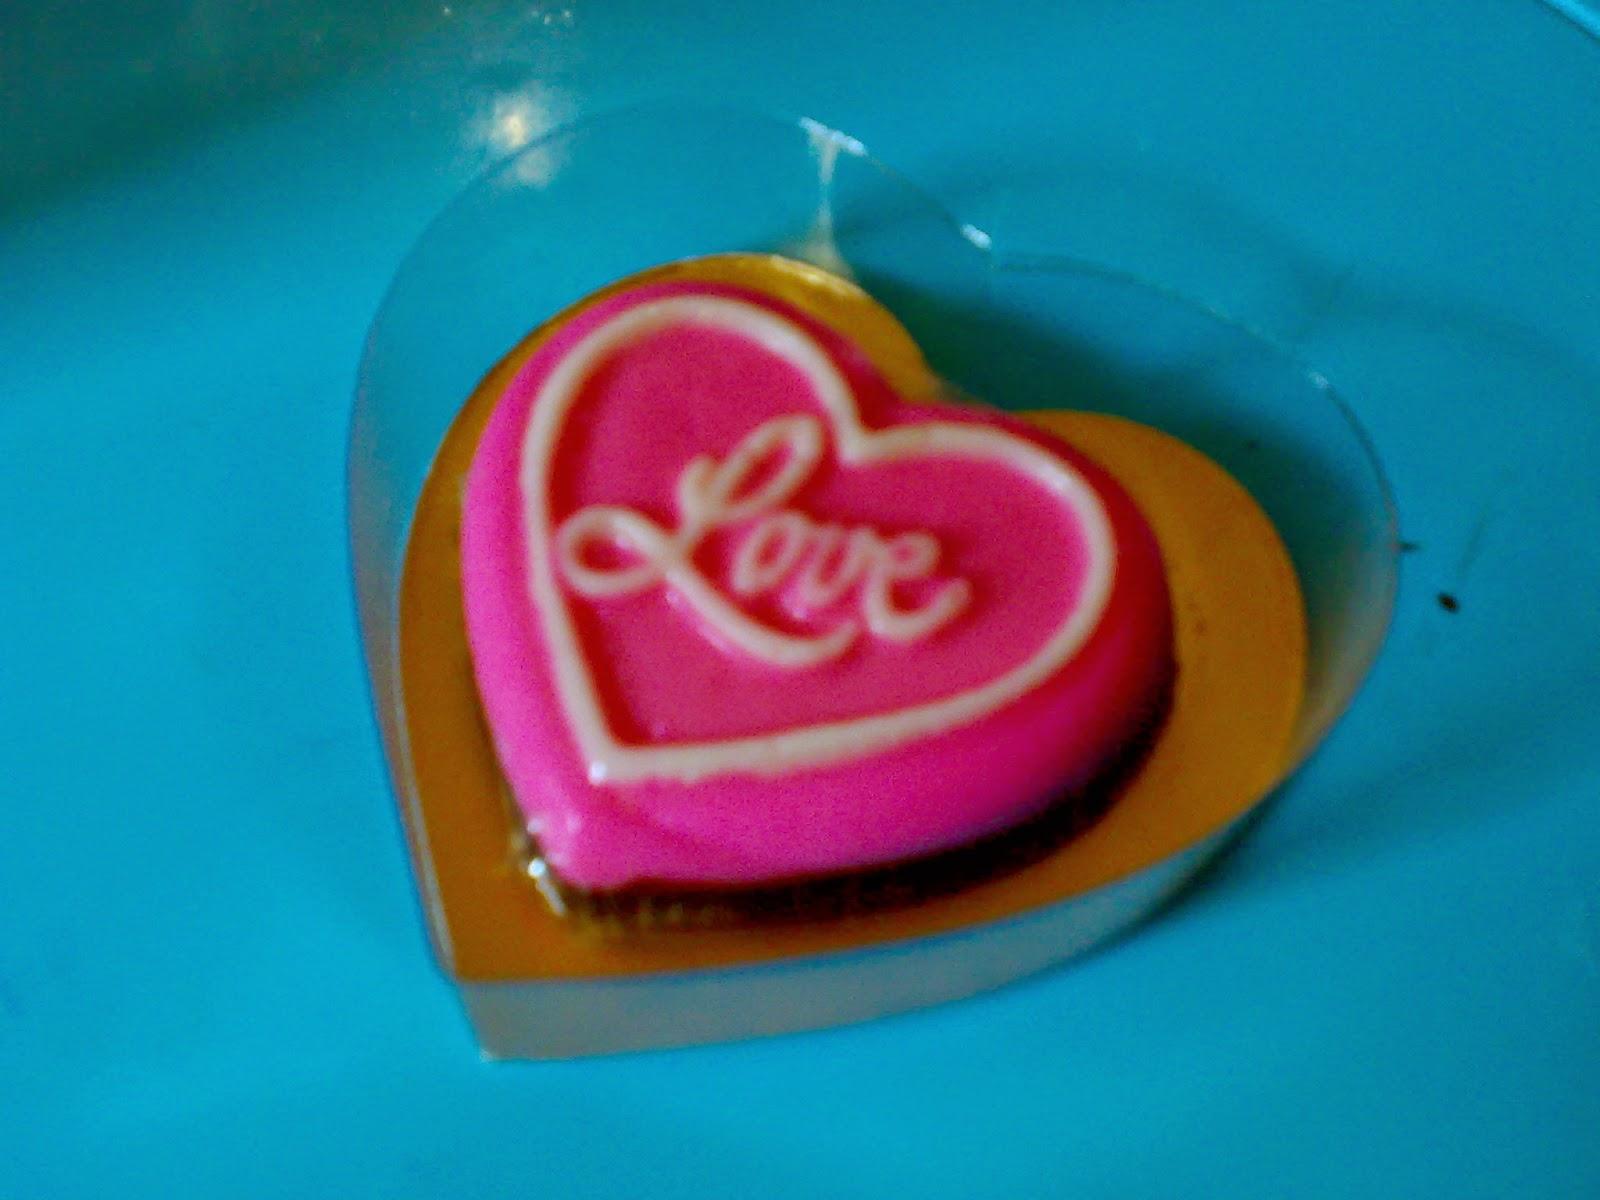 toko coklat valentin online, toko kue yasmin, yasmin cakes